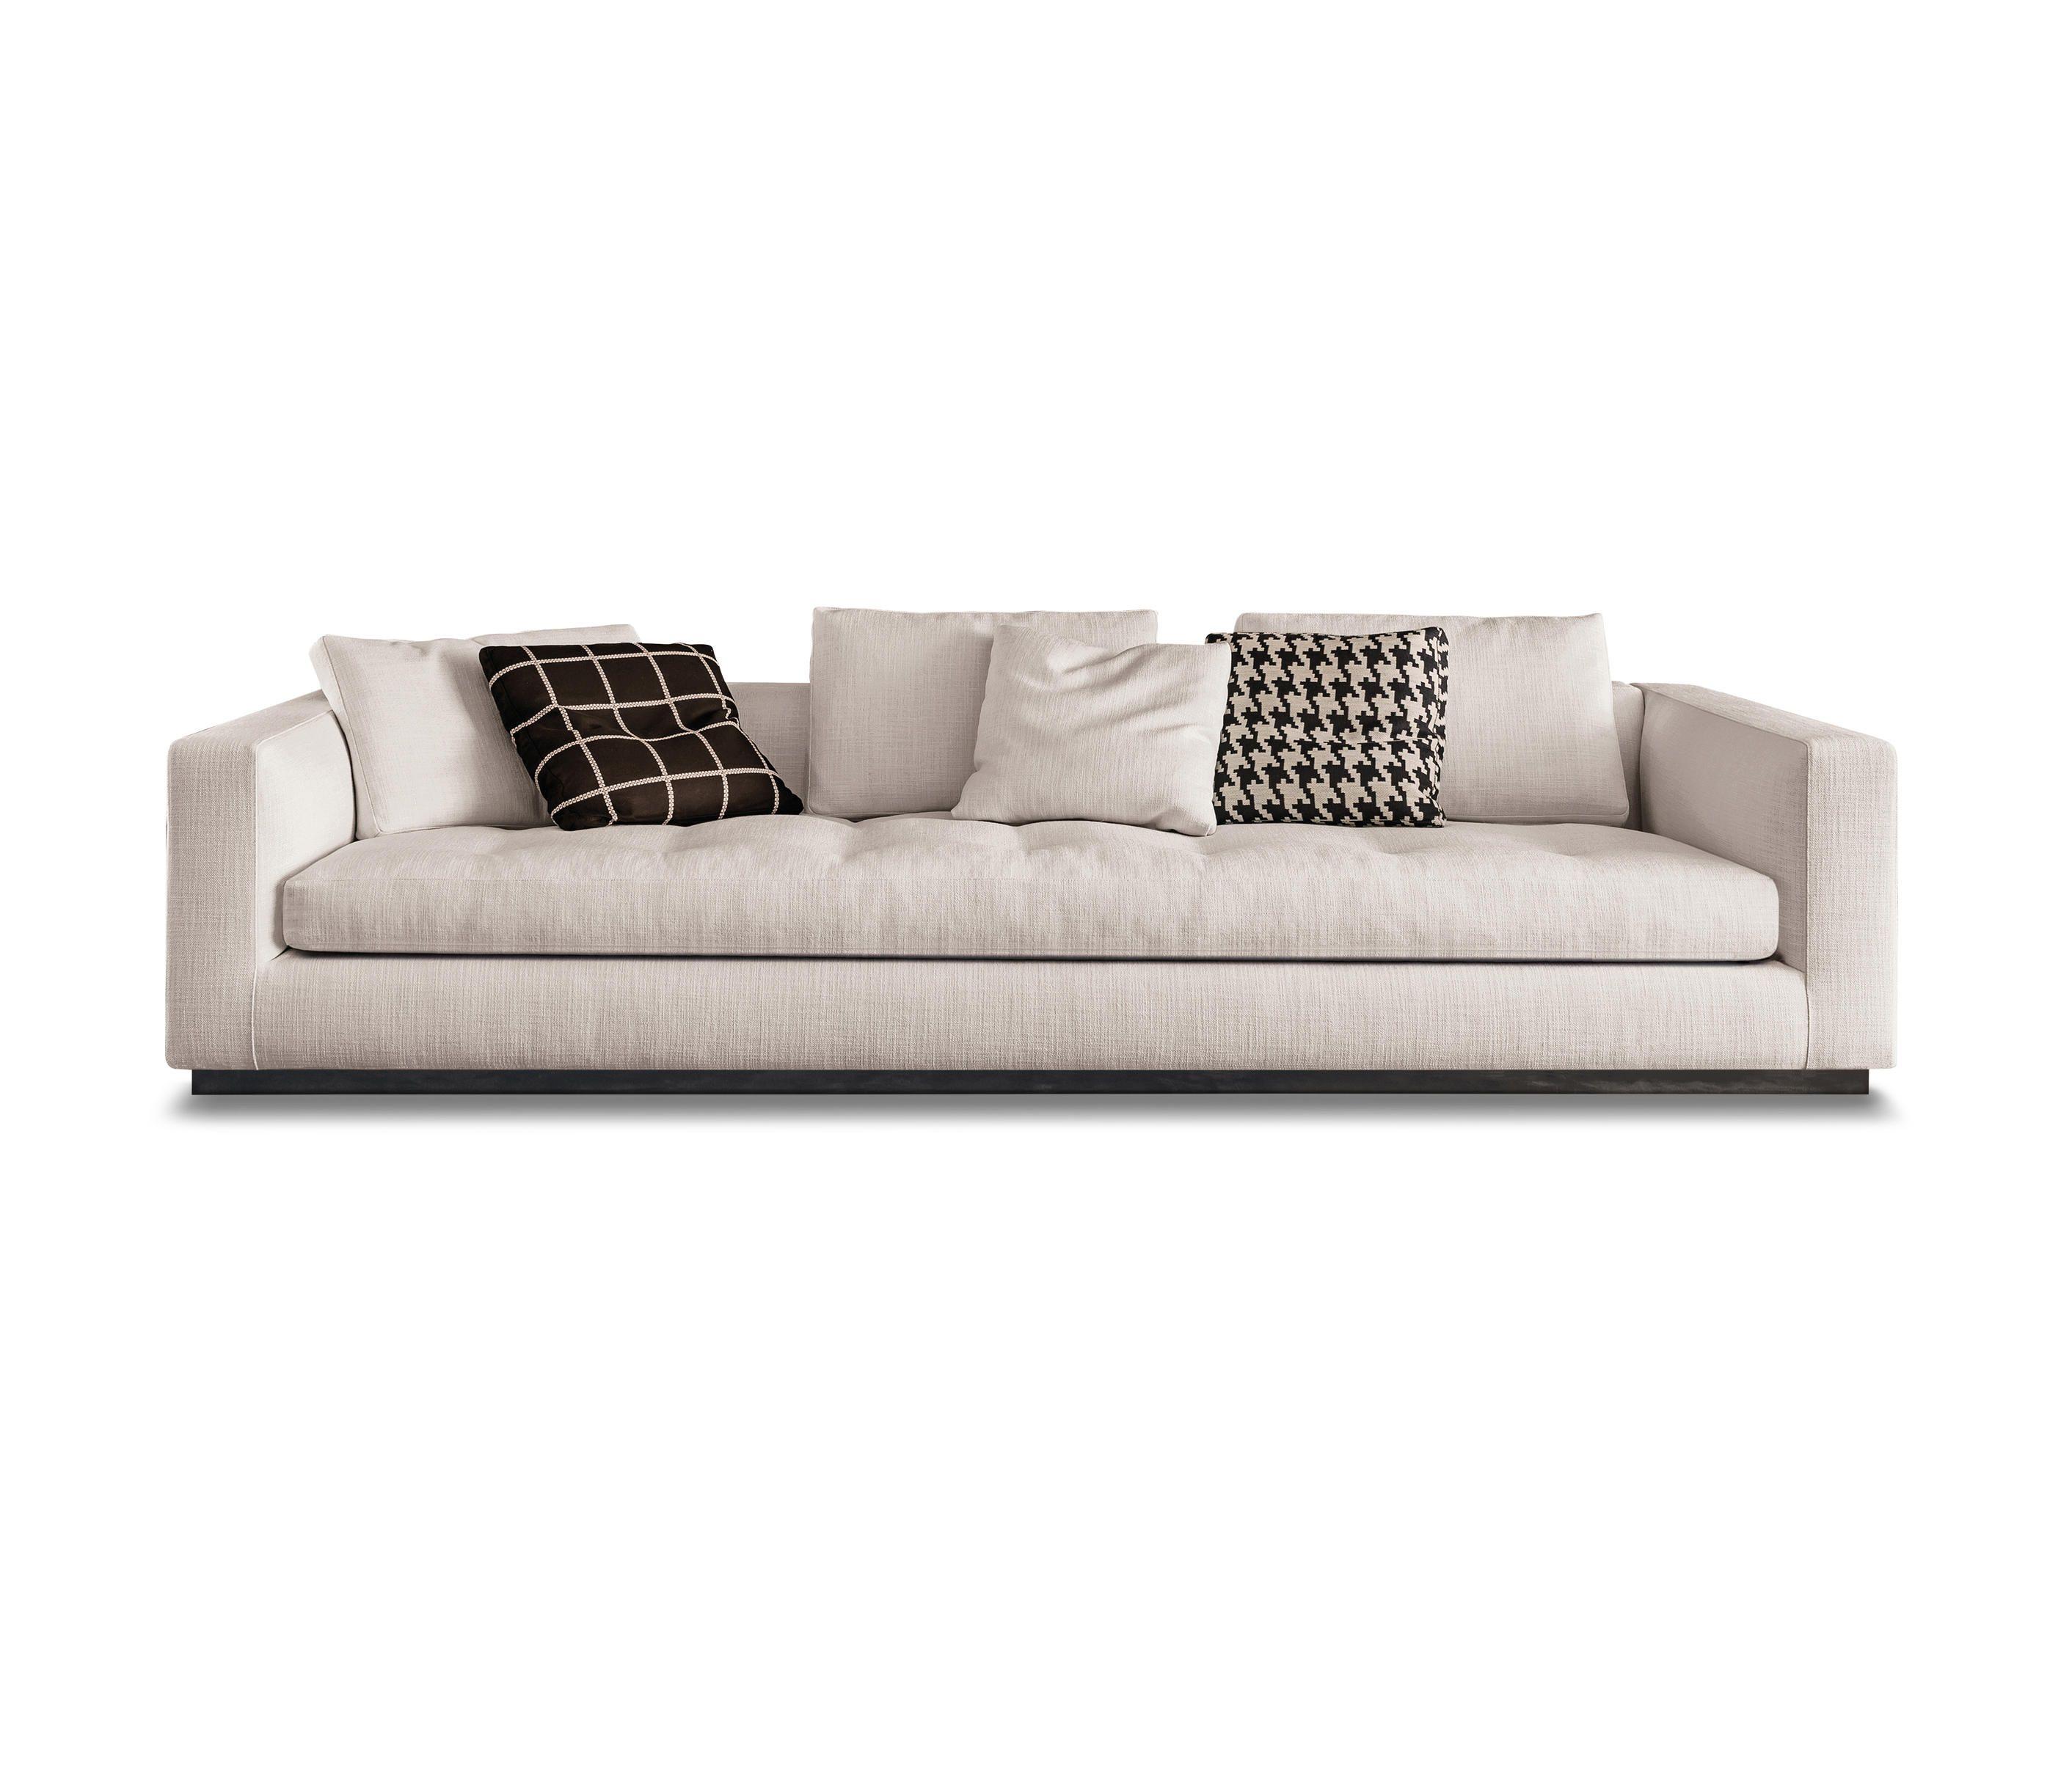 Versace sofa Furniture Pinterest